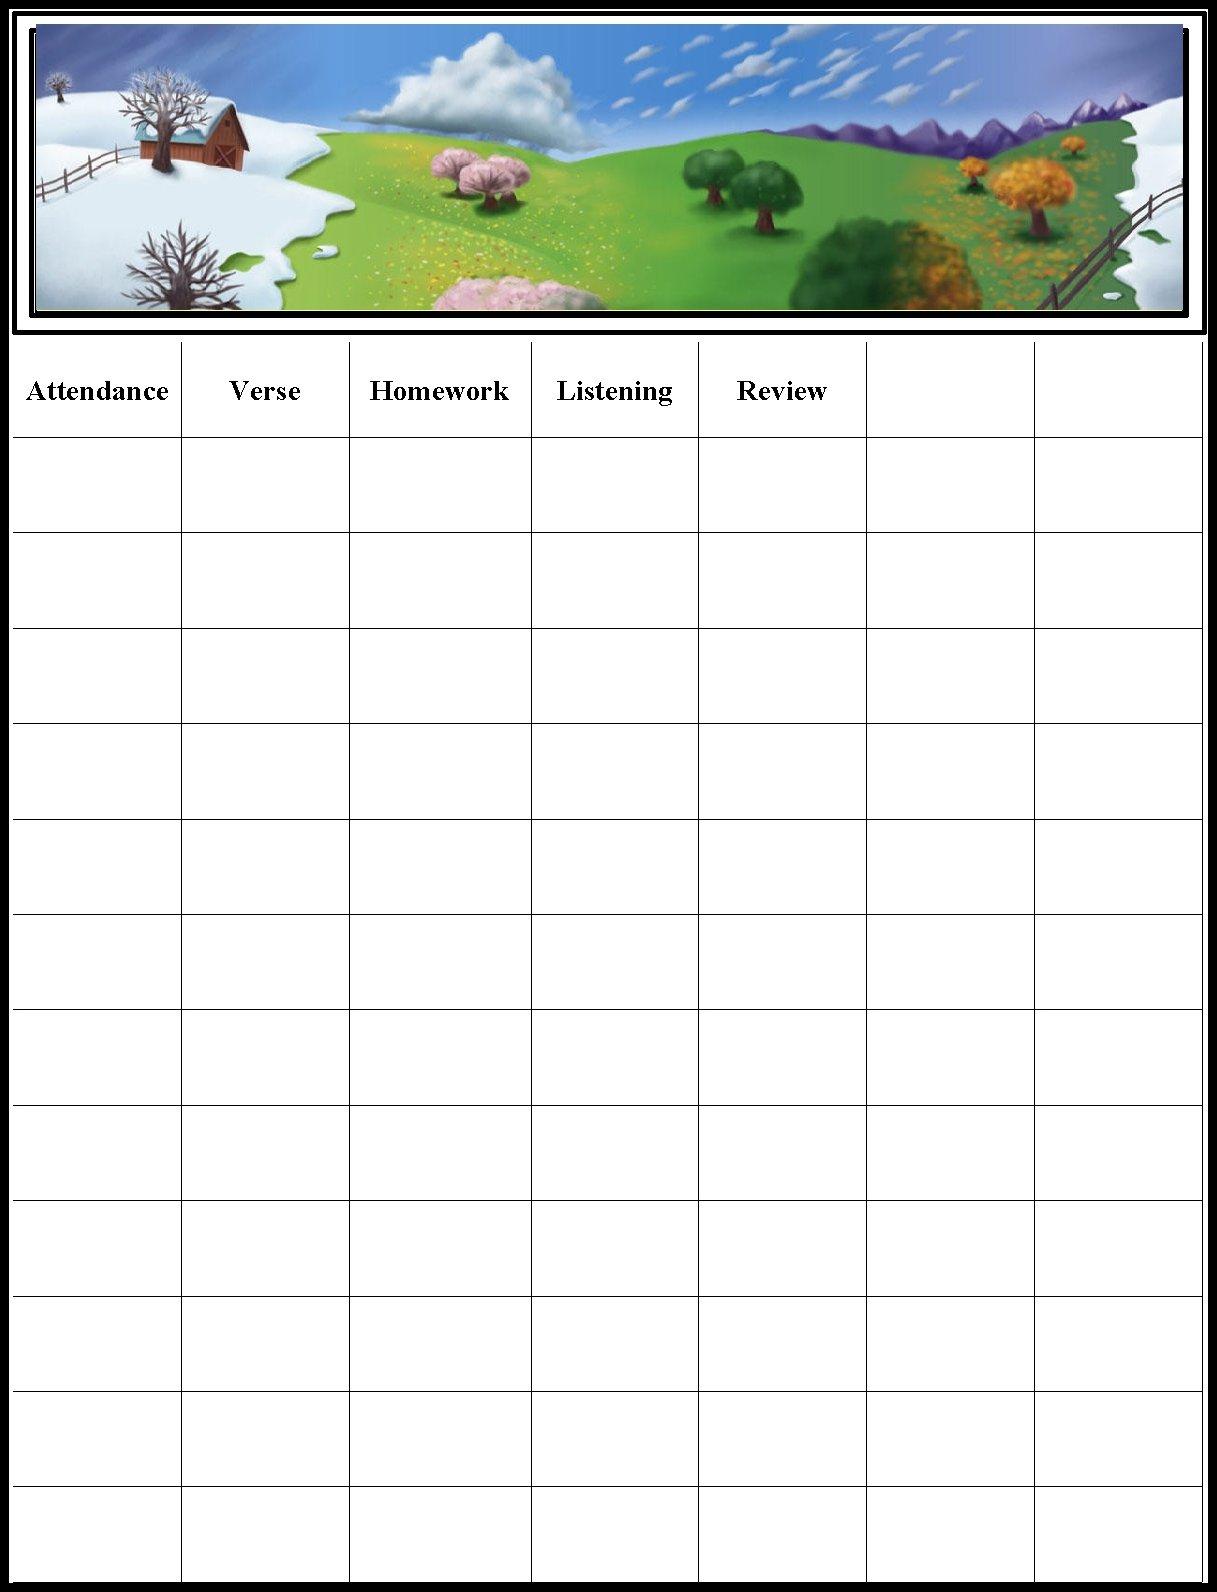 Children's Gems In My Treasure Box: Sunday School - Attendance Chart - Free Printable Sunday School Attendance Sheet